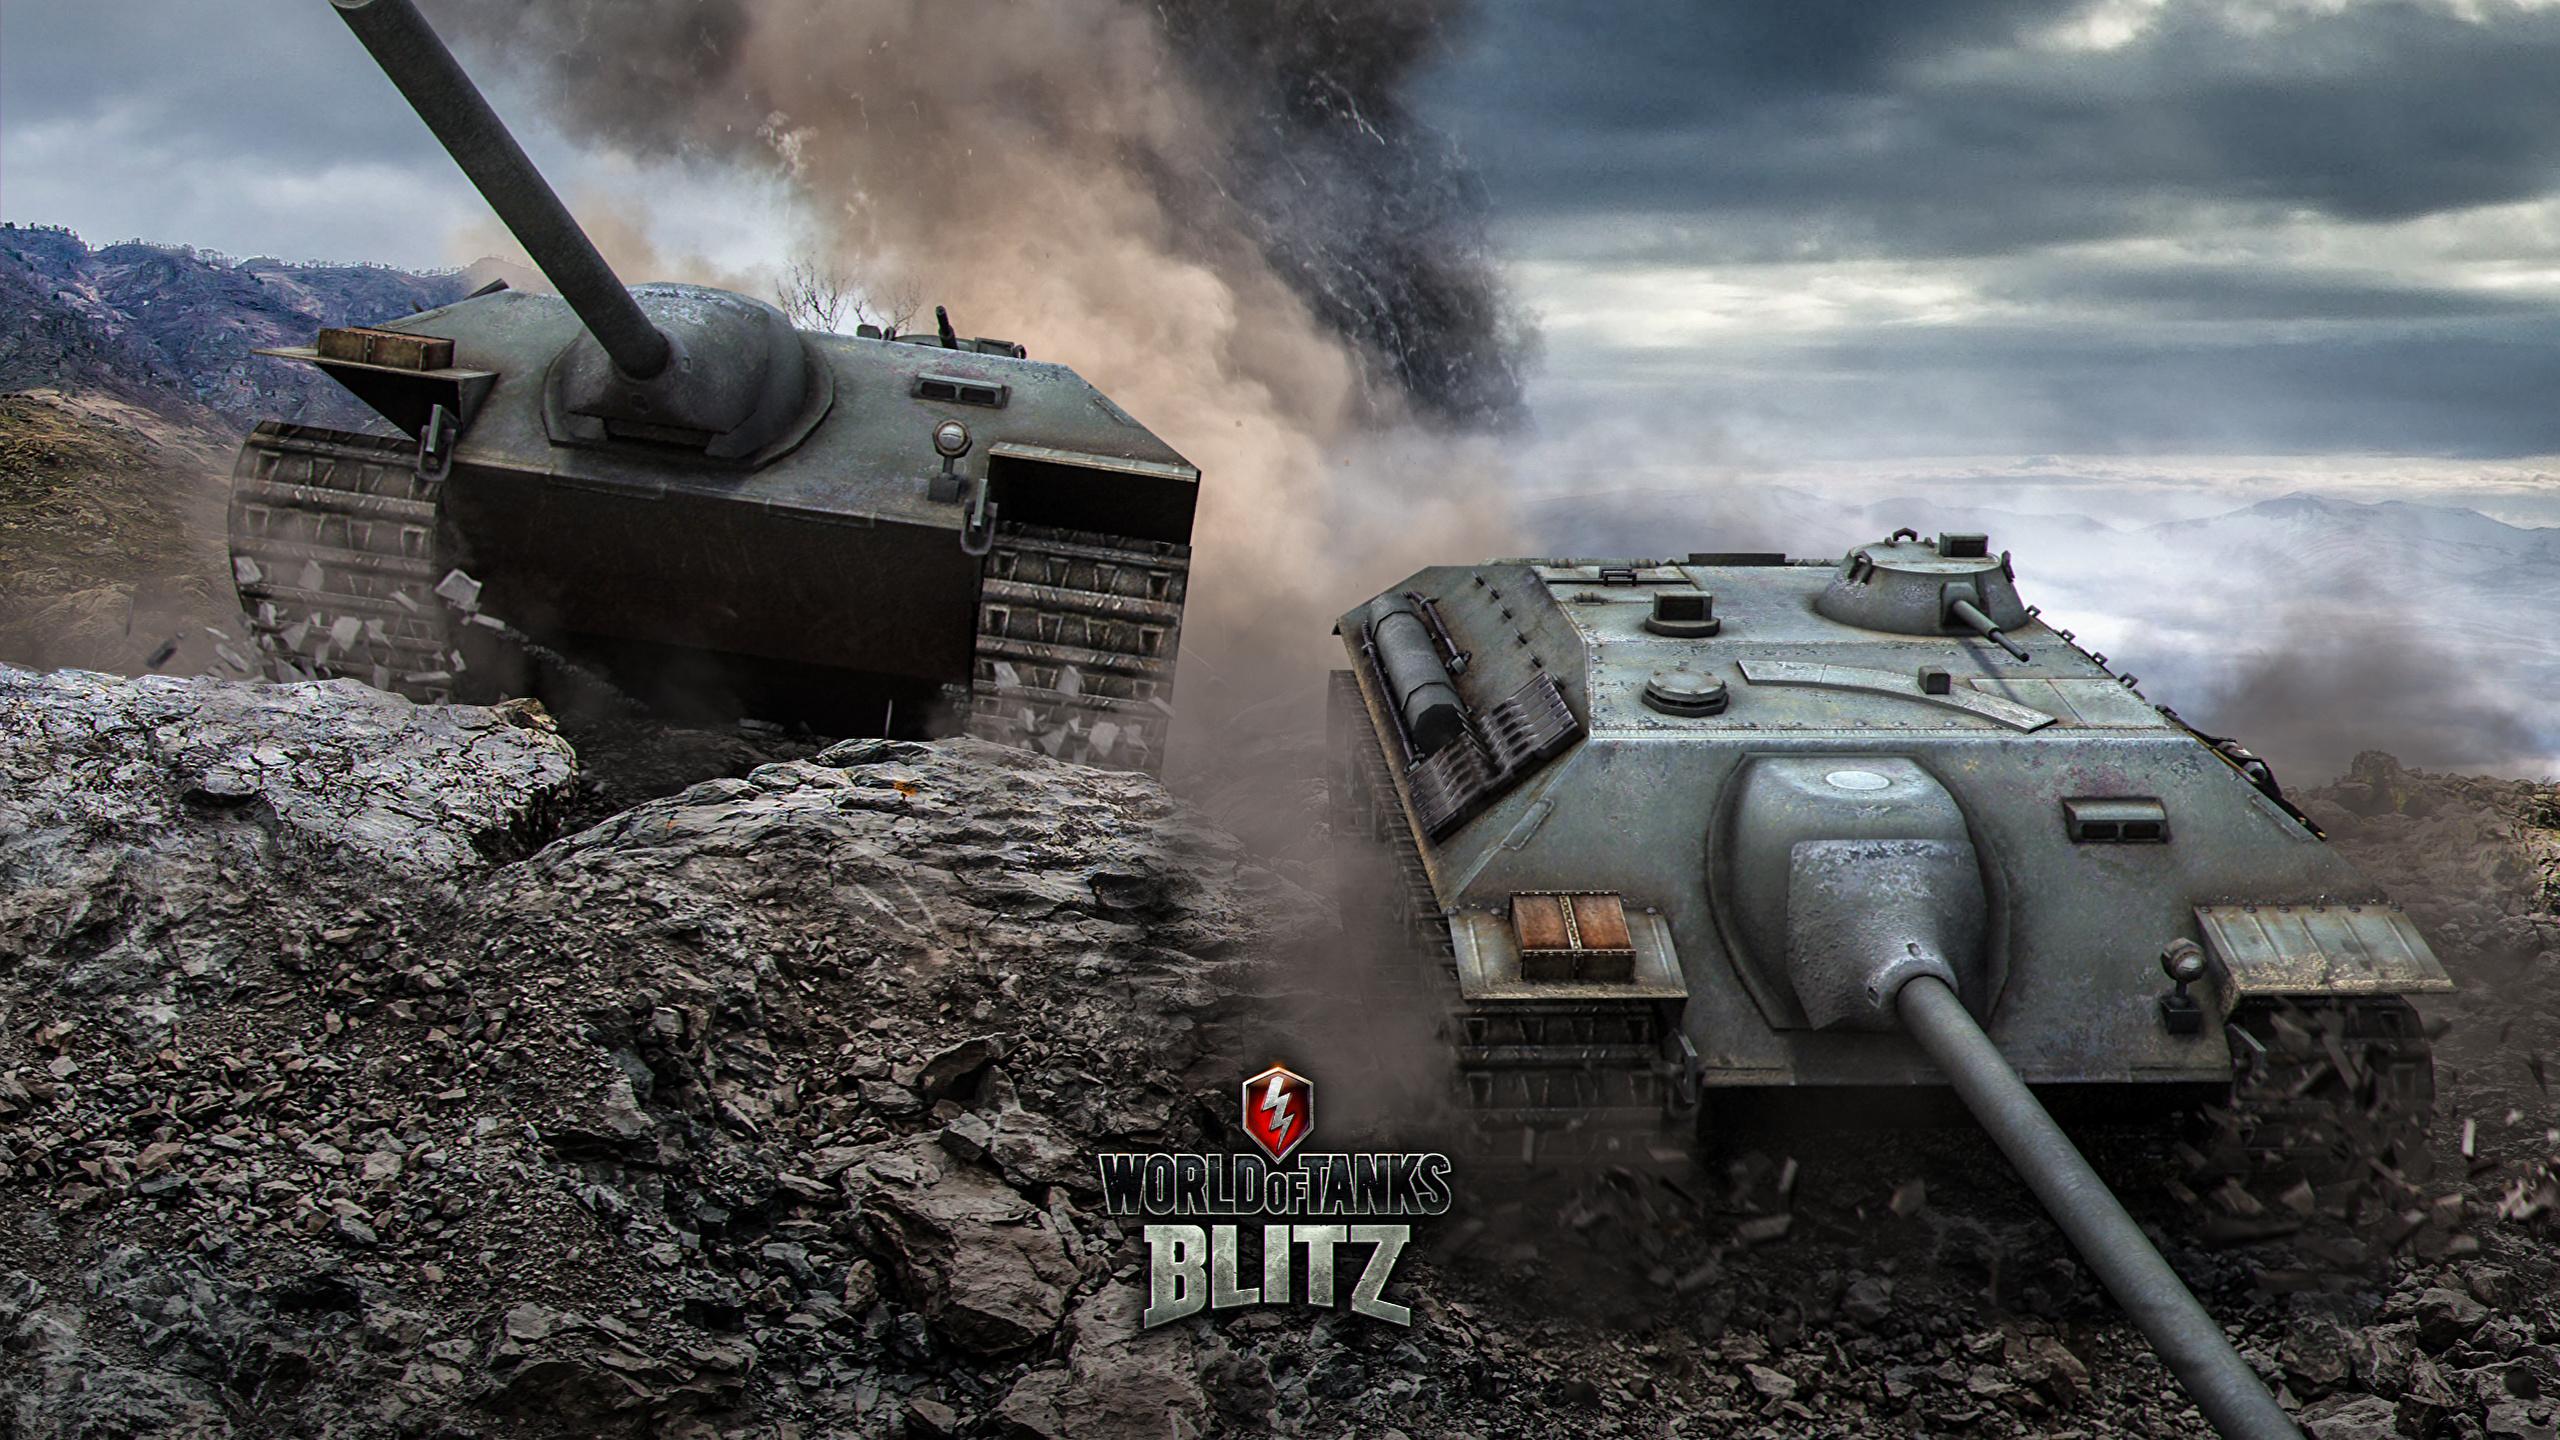 Wallpaper World Of Tanks Self Propelled Gun German Blitz 2560x1440